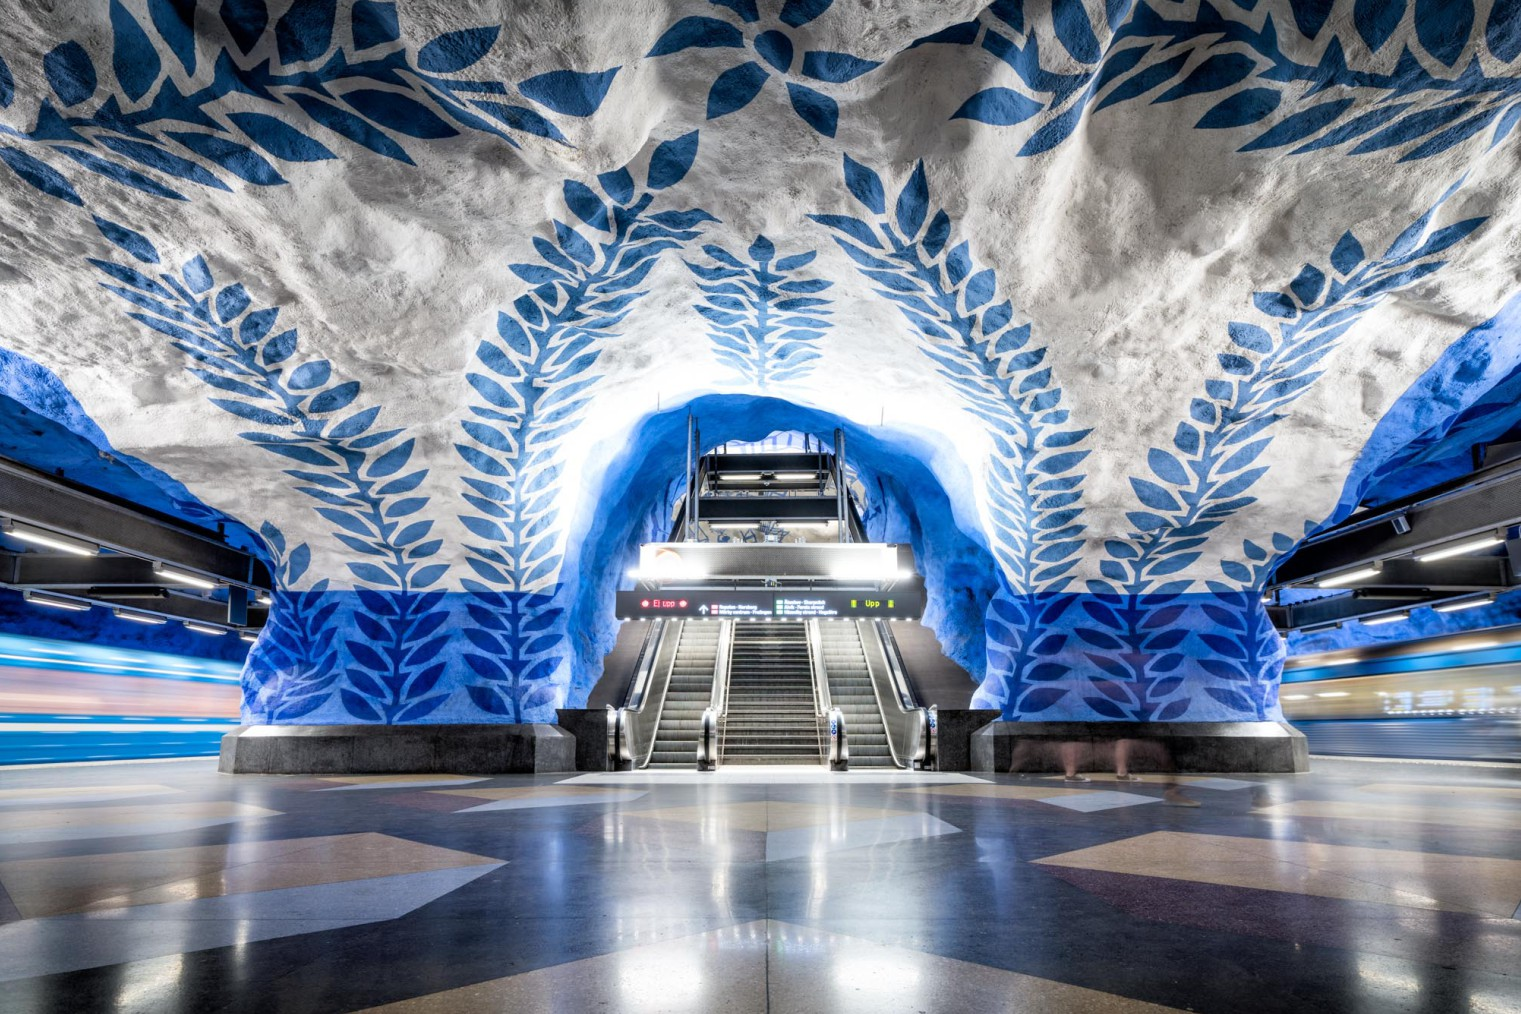 Stockholm metro (Tunnelbana), travel. Метро Стокгольма, туризм